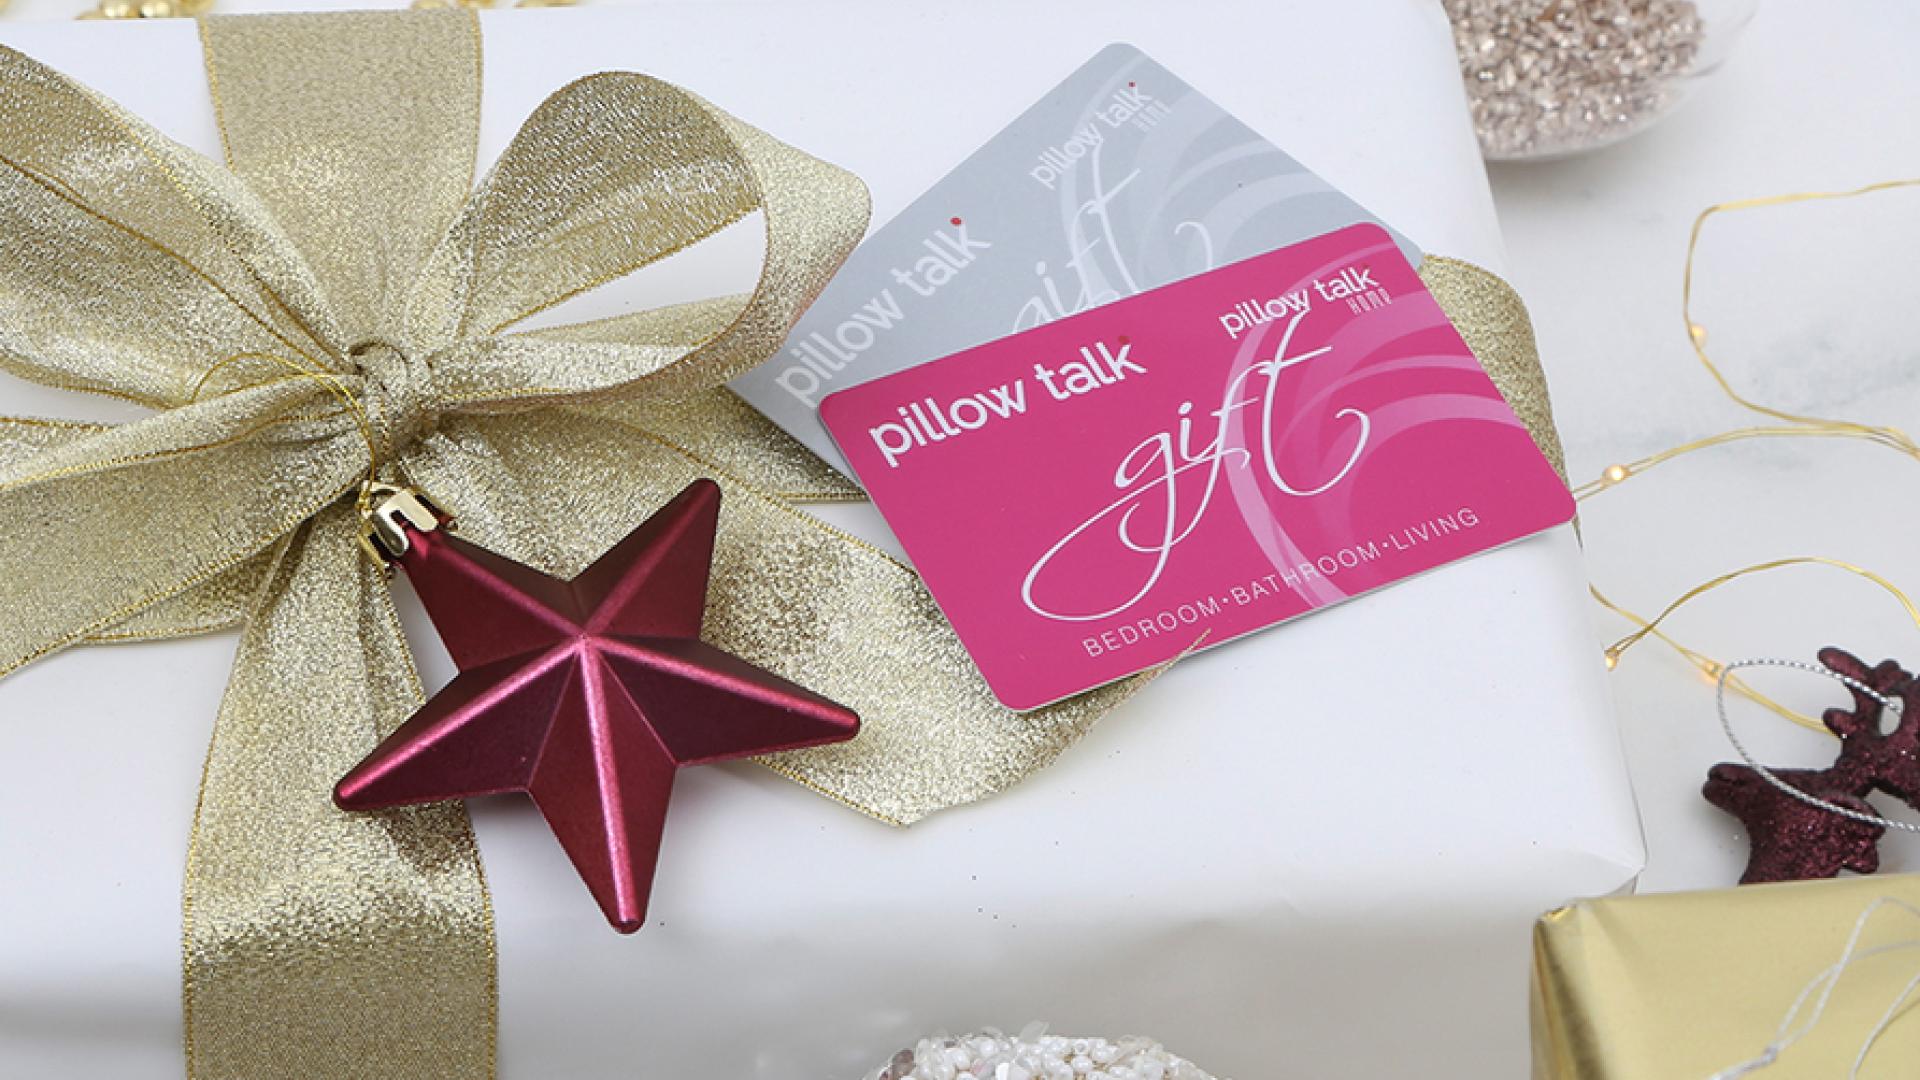 Pillow Talk Giveaway